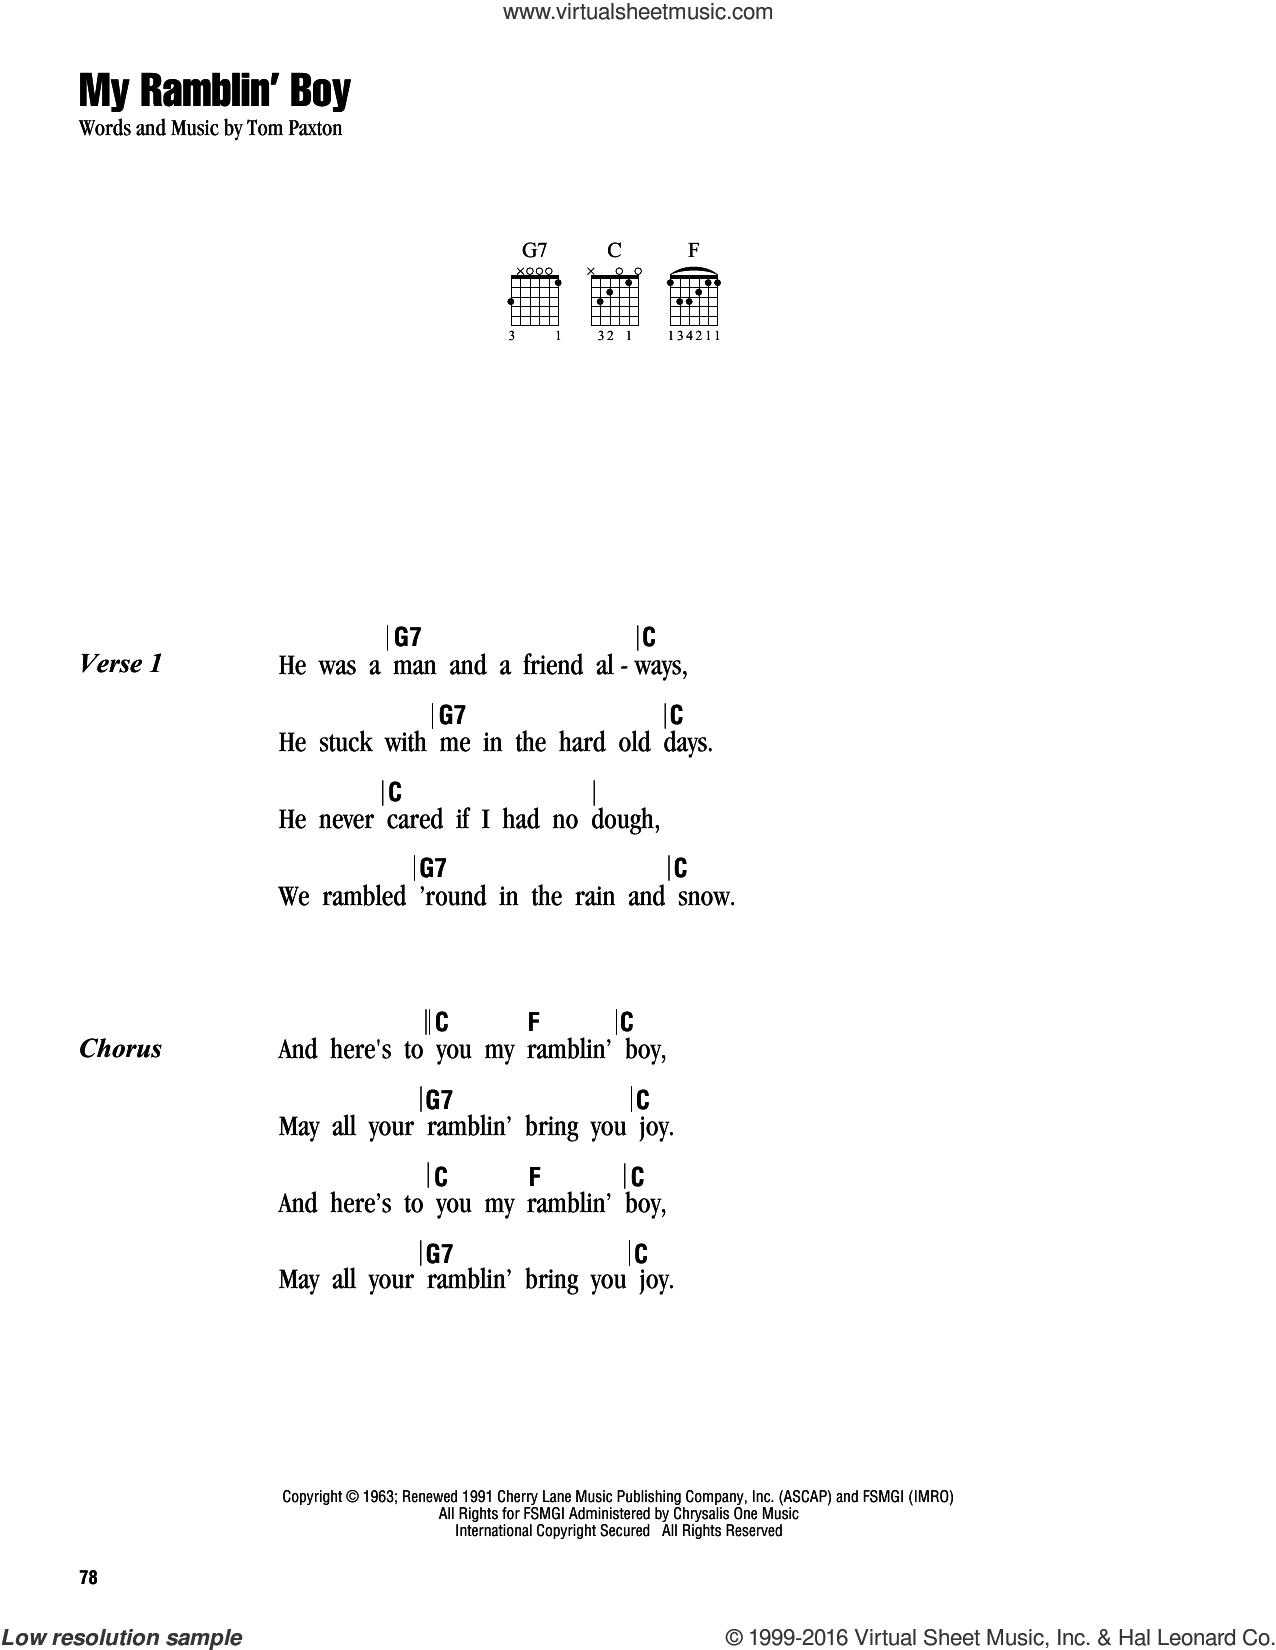 My Ramblin' Boy sheet music for guitar (chords) by Tom Paxton, intermediate skill level